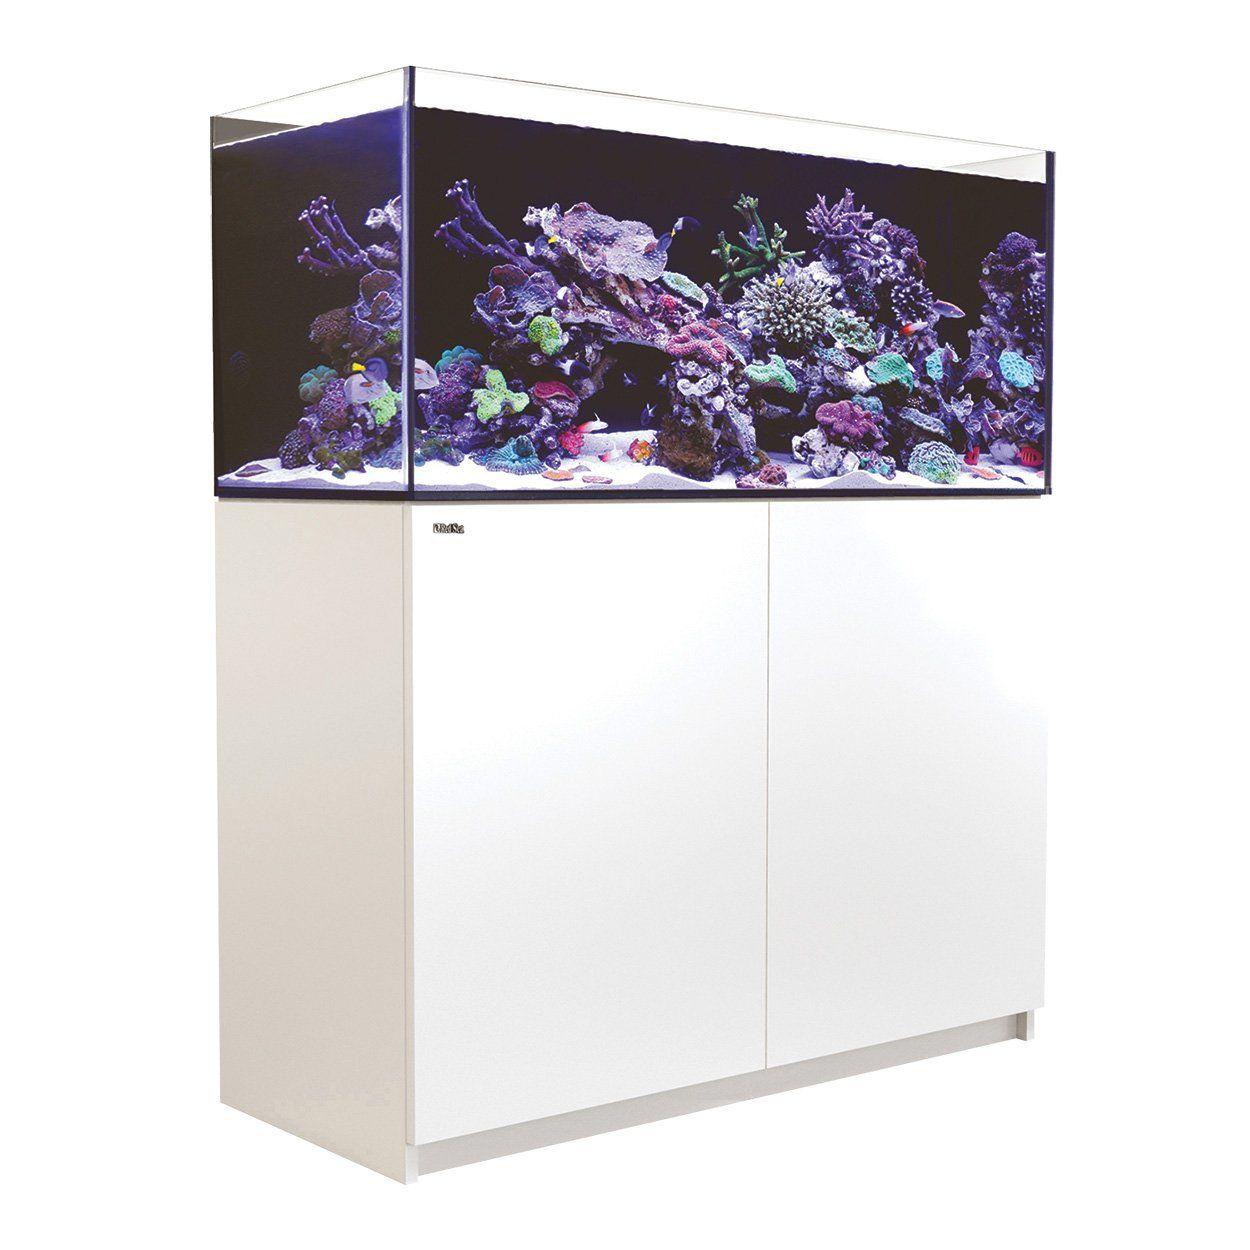 large home aquarium Red Sea 23436 Reefer XLarge 425